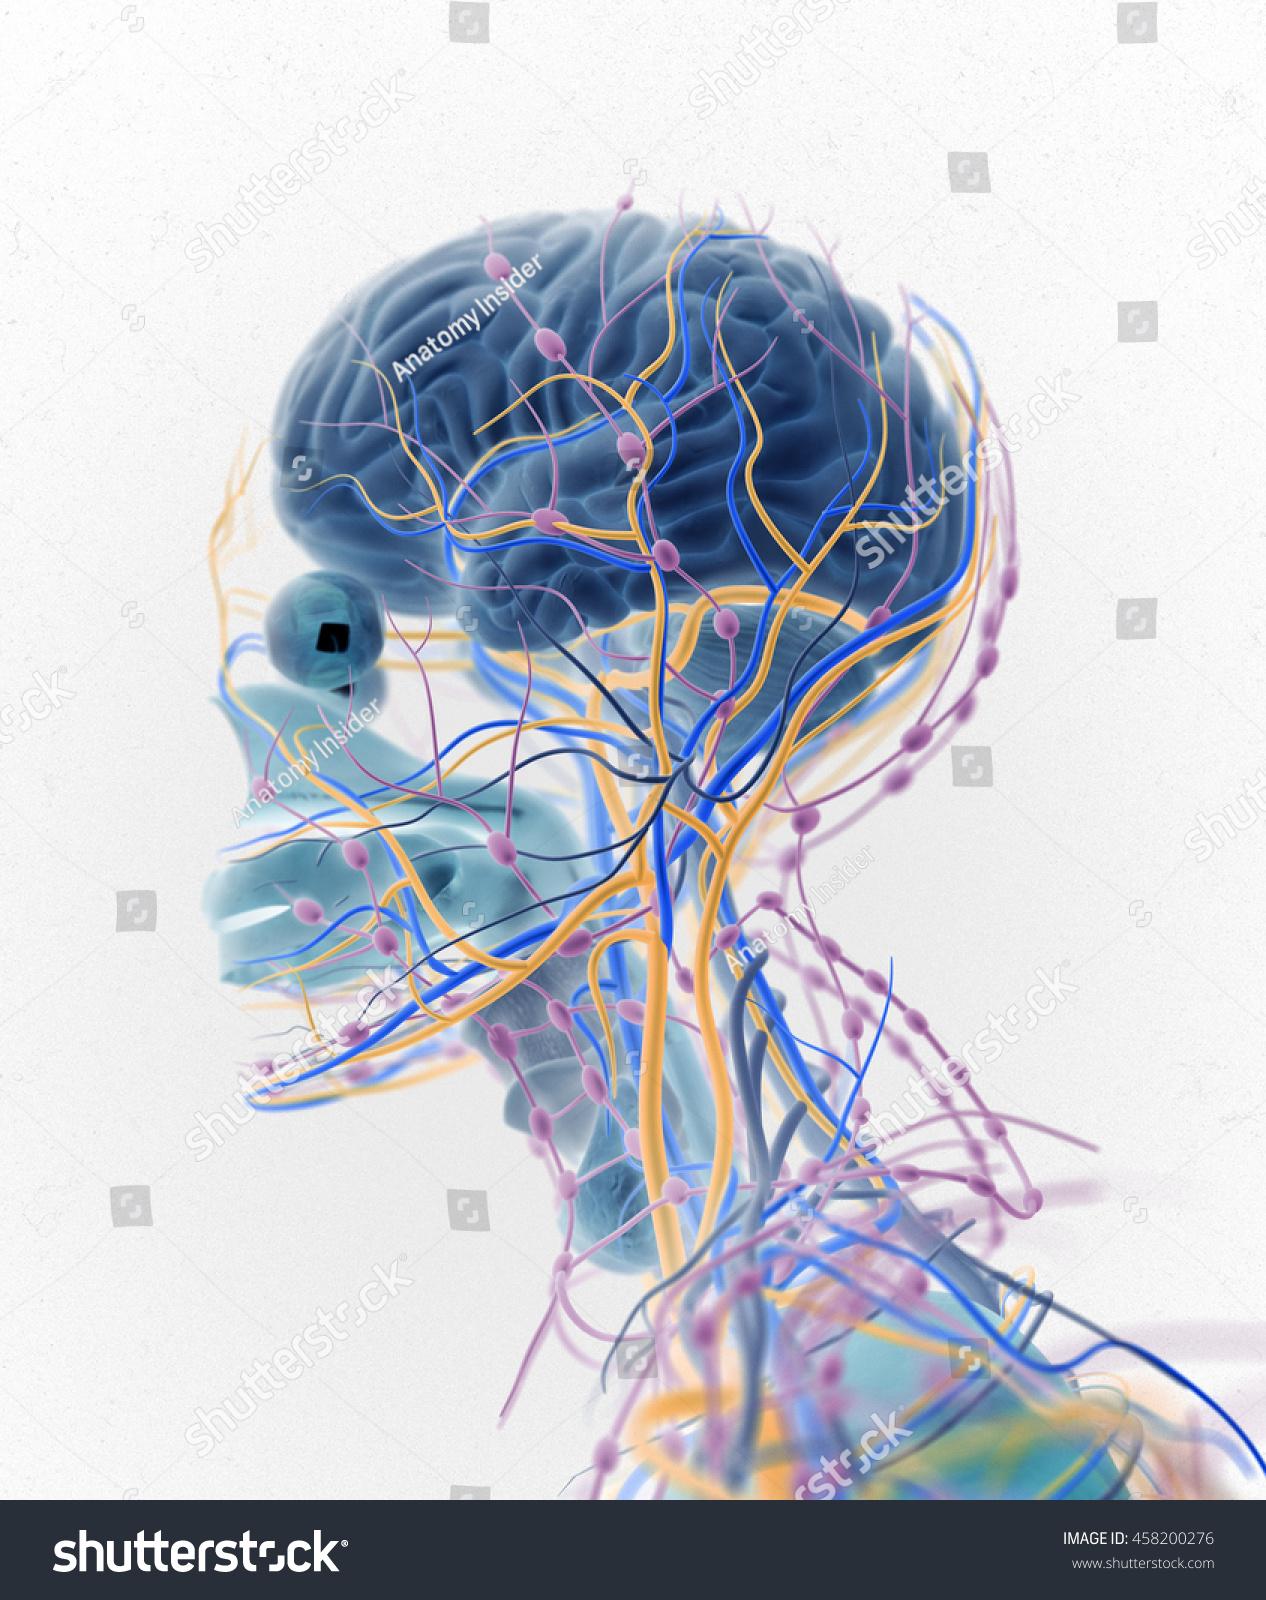 Brain Arteries Nerves Lymph Nodes Human Stock Illustration 458200276